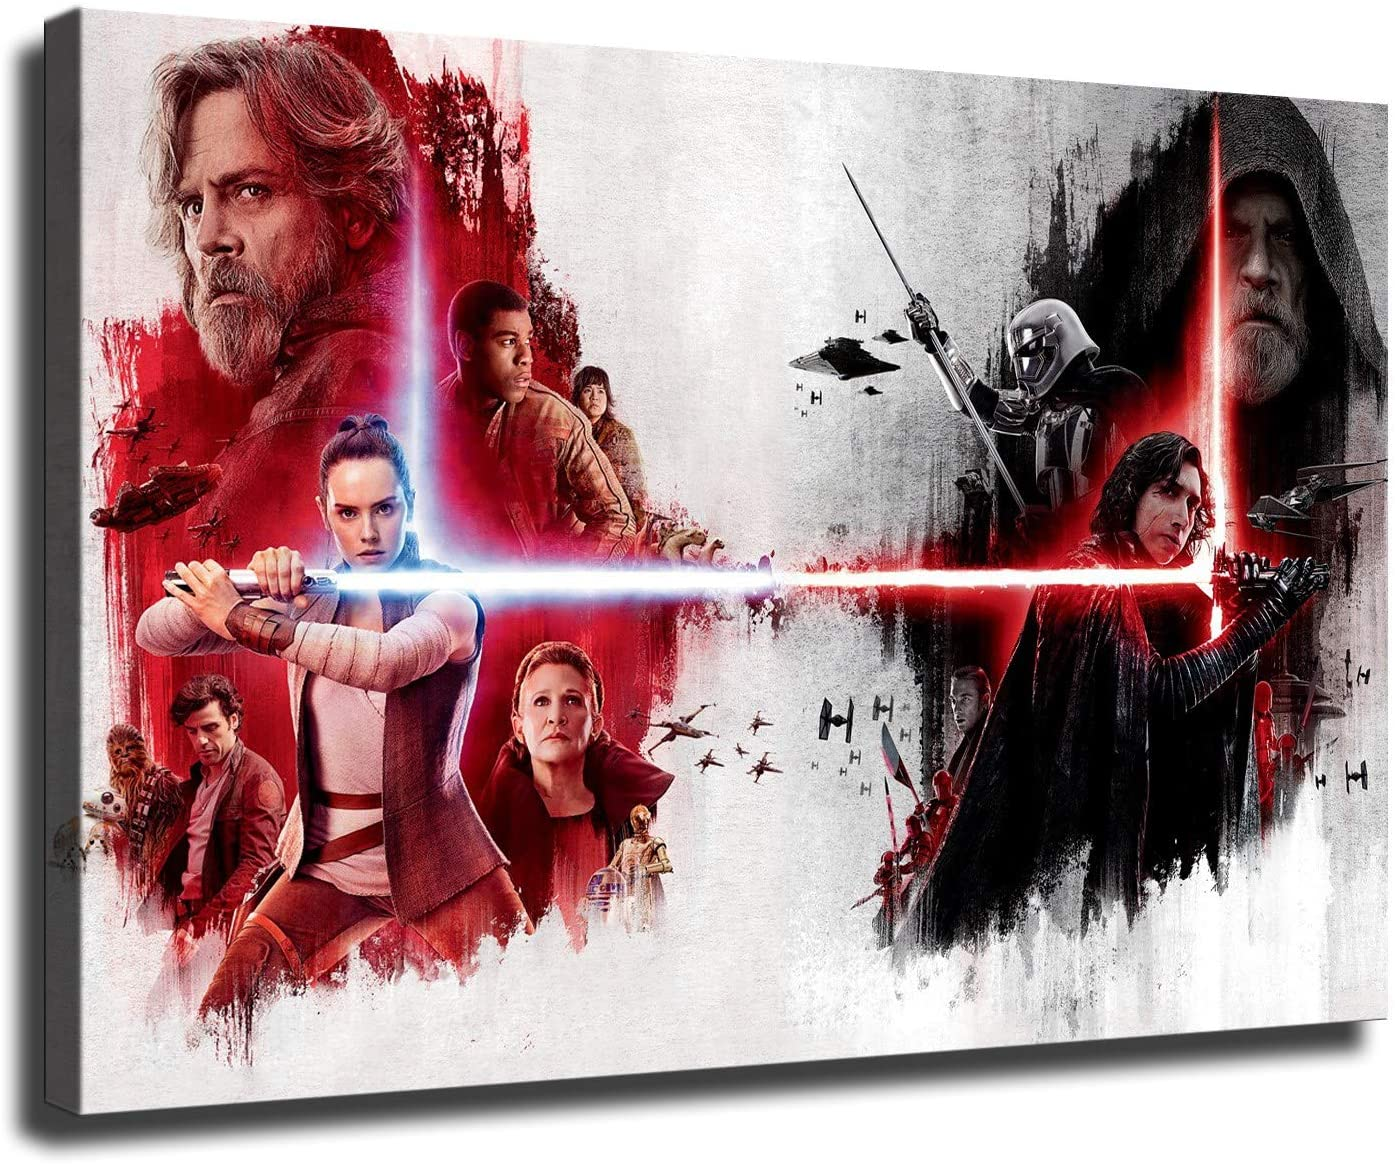 Star wars Canvas The Last Jedi HD printing wall decor art (16x24inch,No framed)